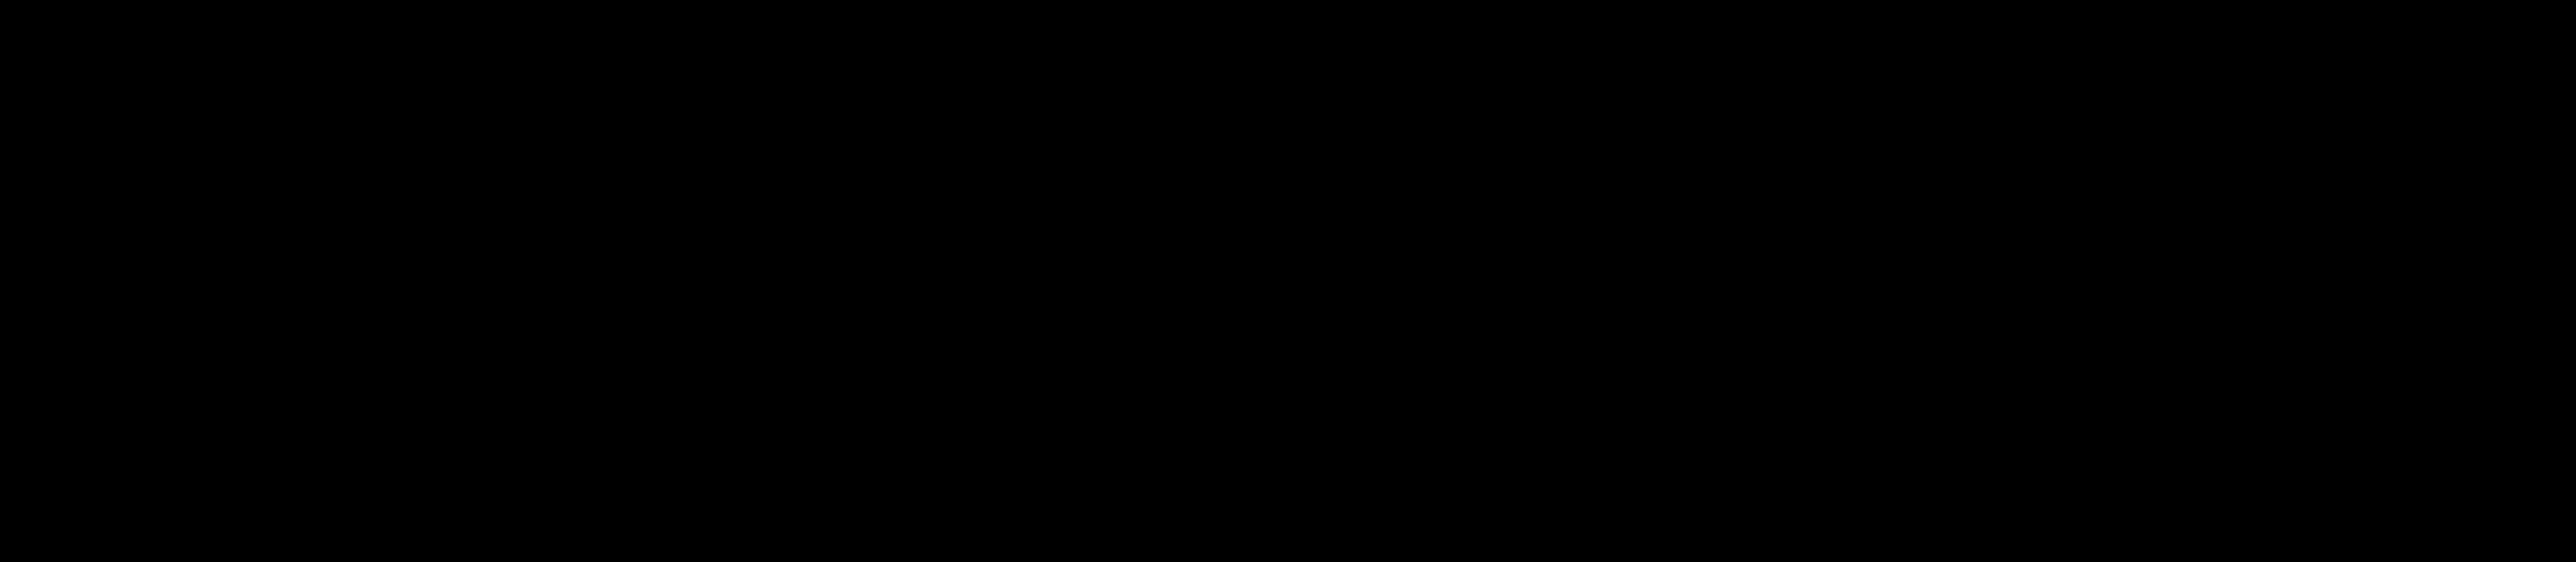 xp investimentos logo - XP Investimentos Logo